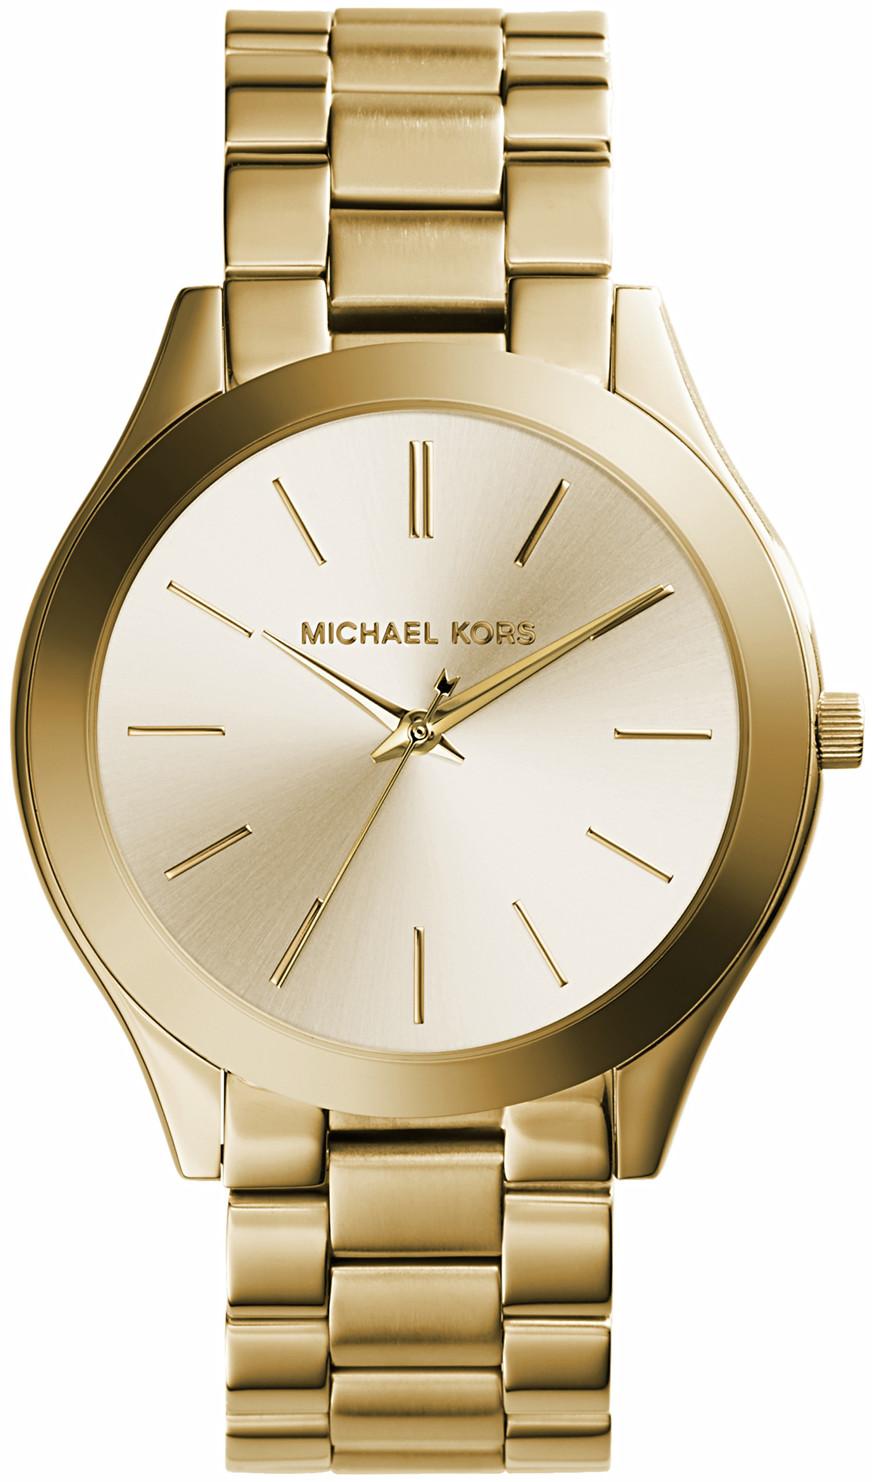 Michael Kors MK3179